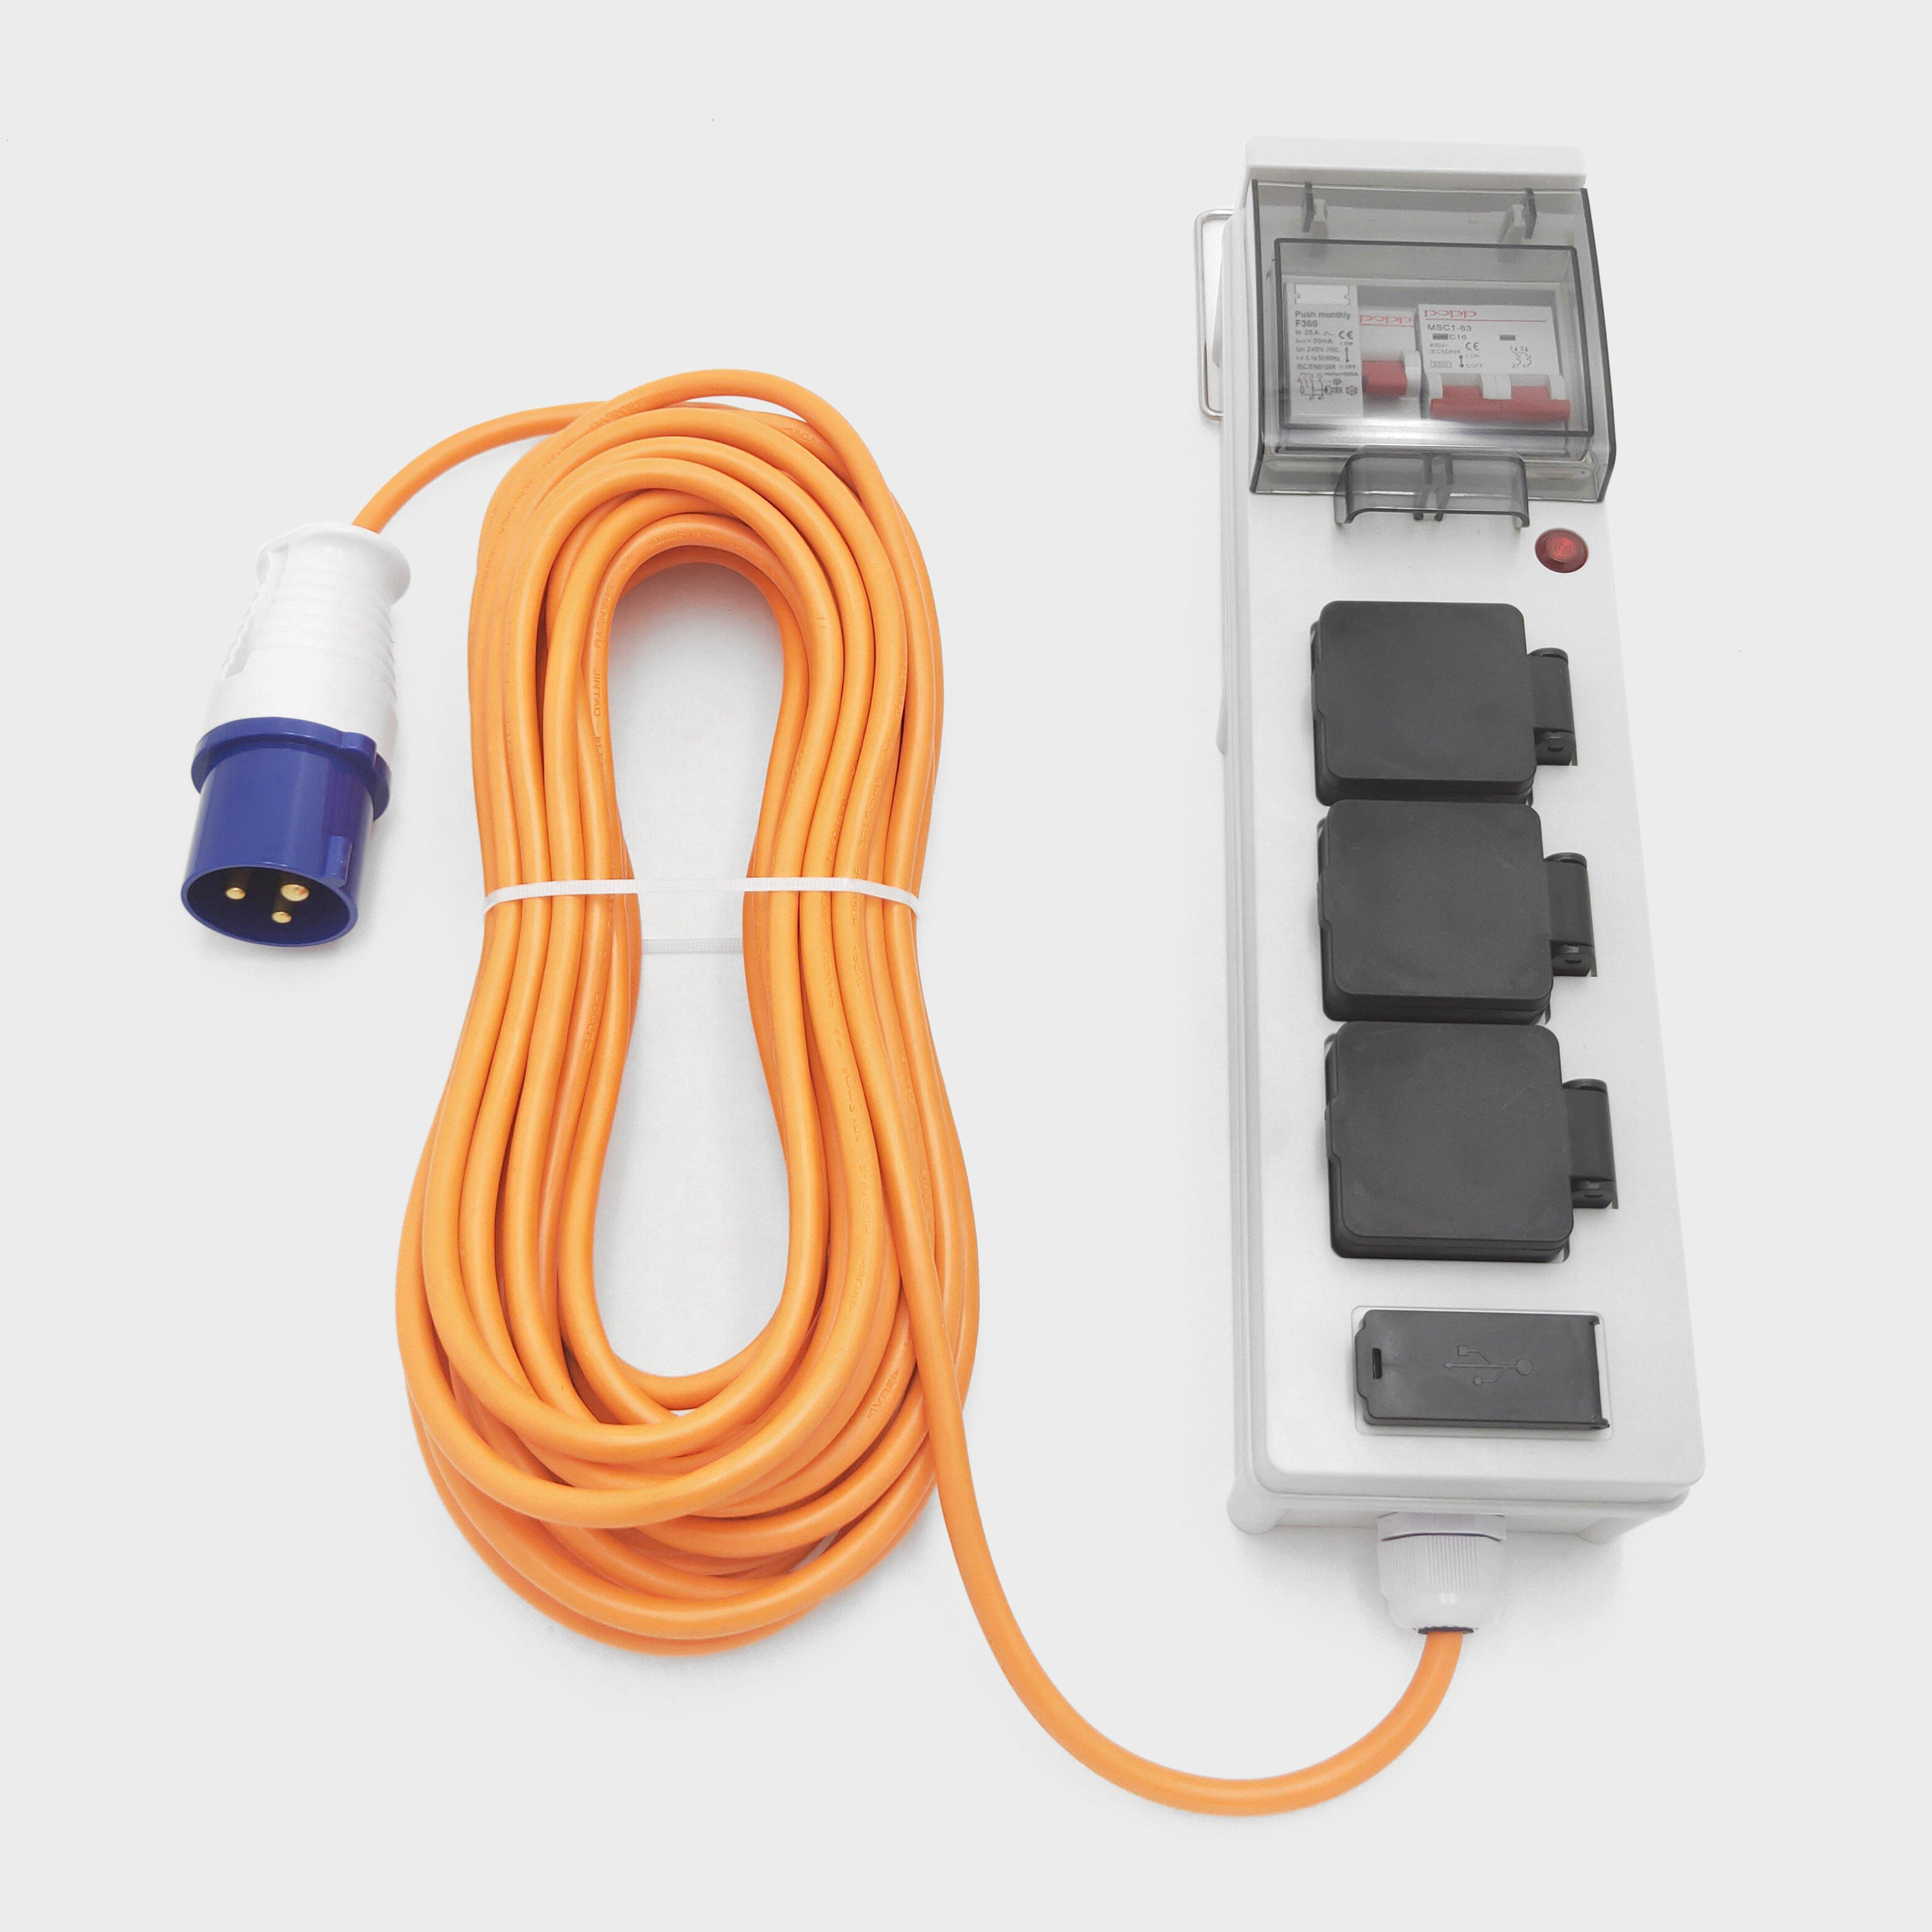 Eurohike Mobile Mains Kit with USB (15m), Multi/LGY